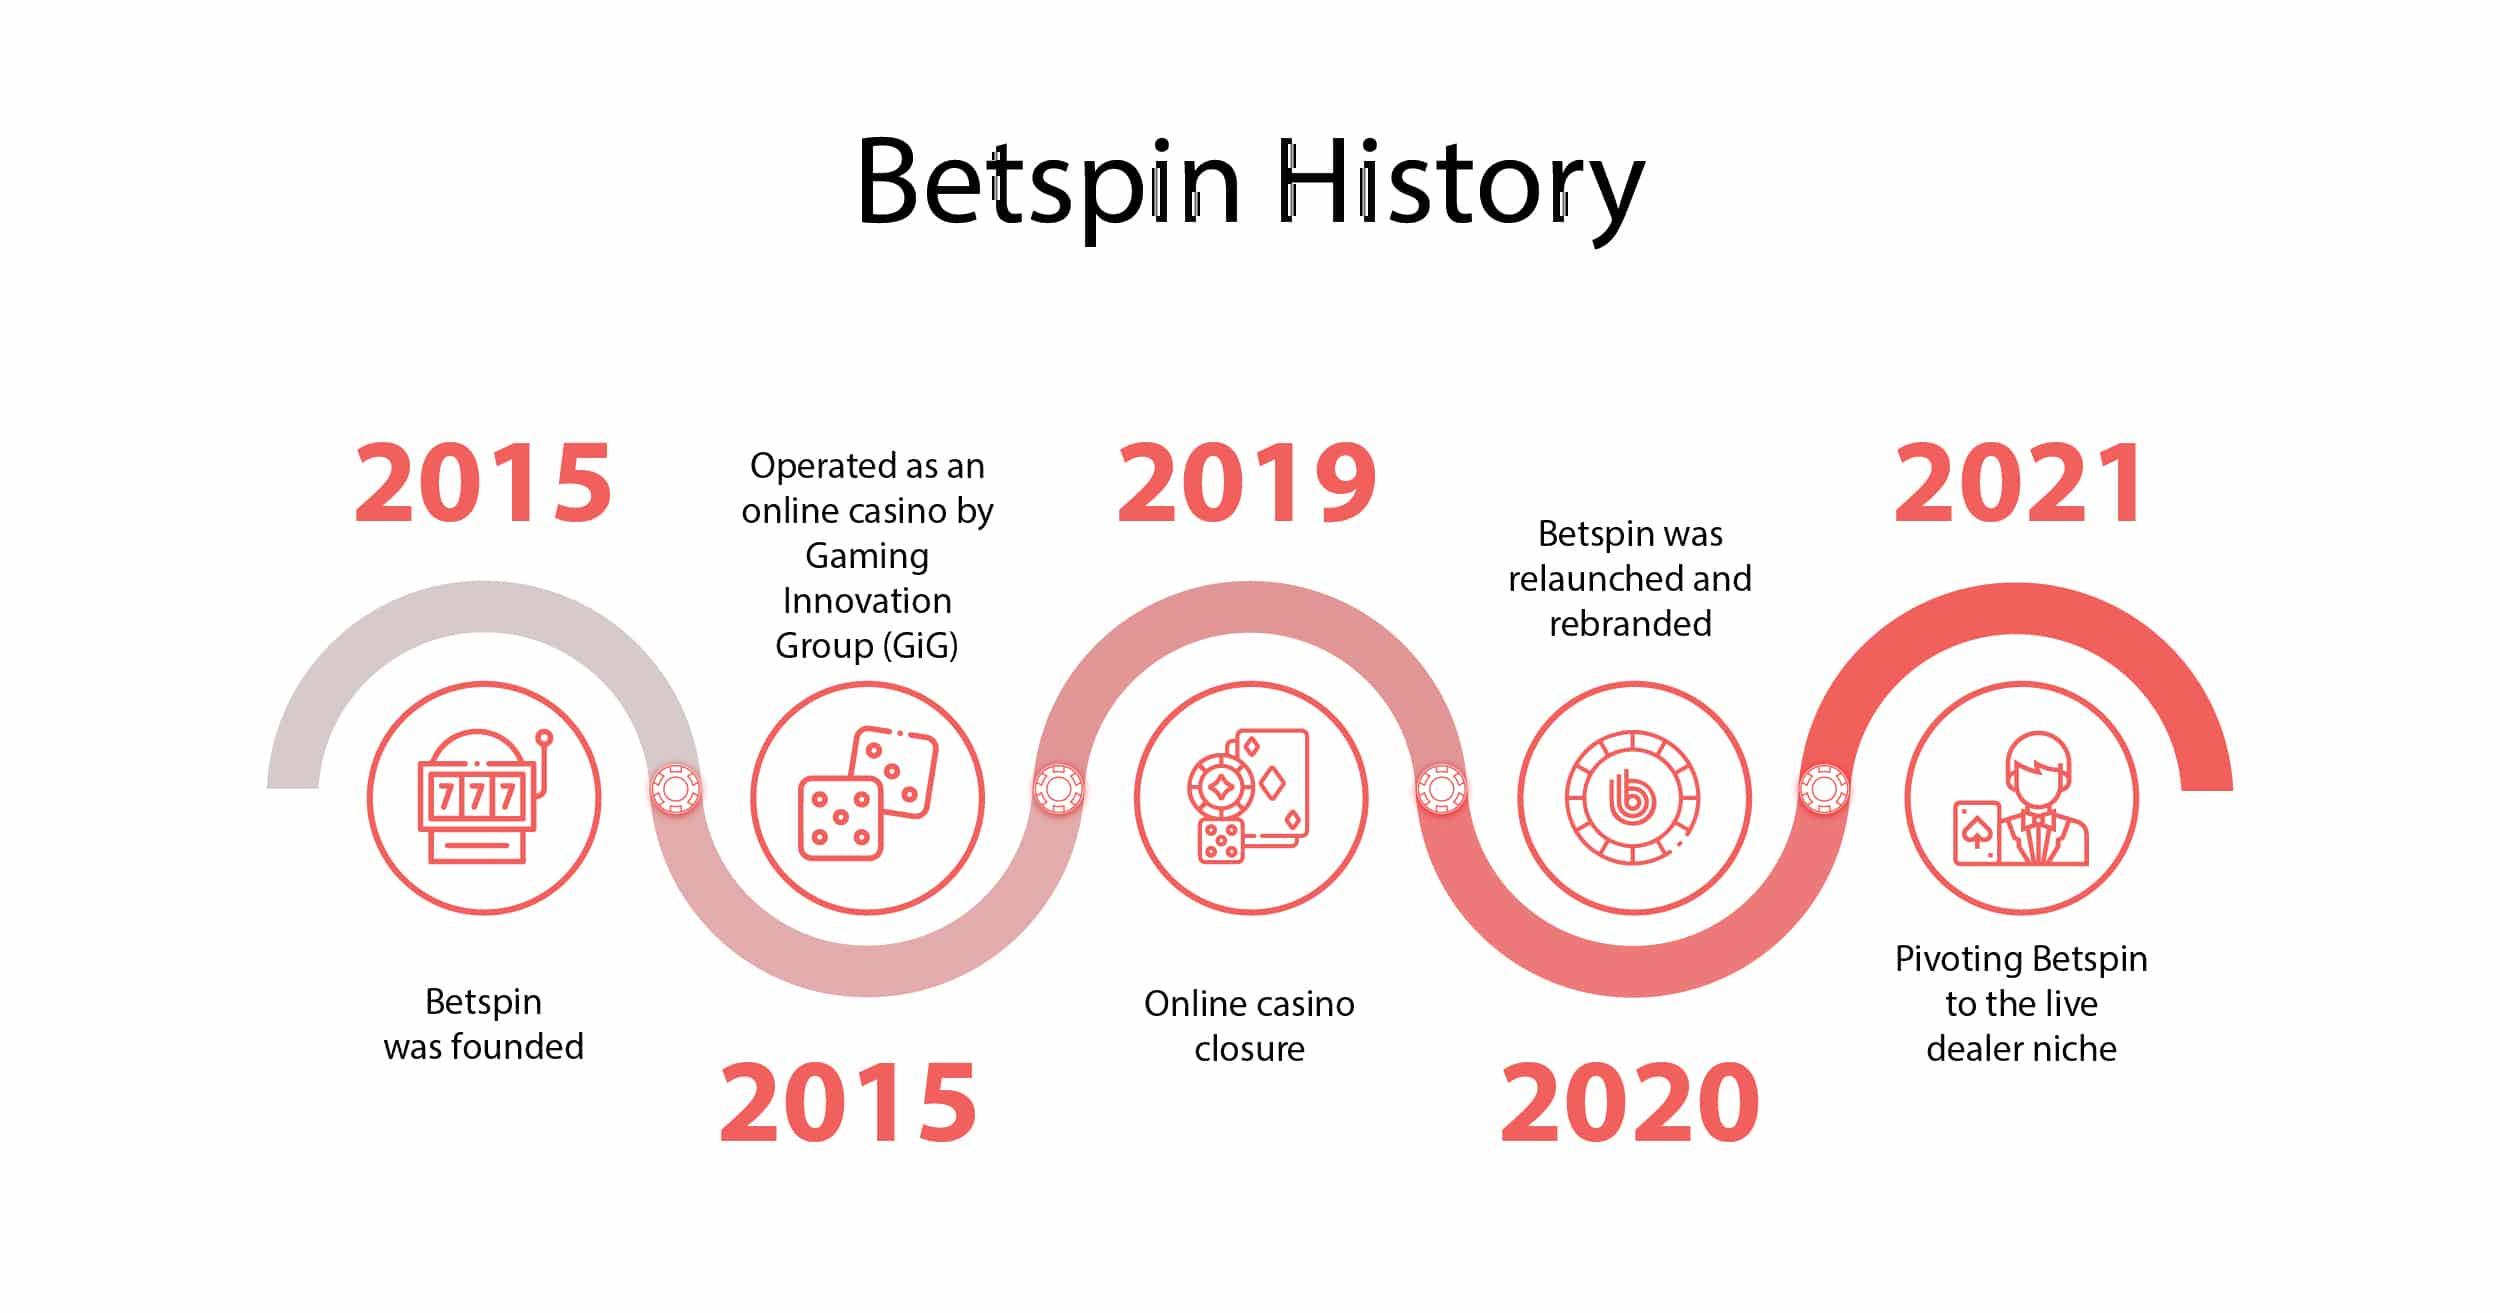 Betspin Timeline